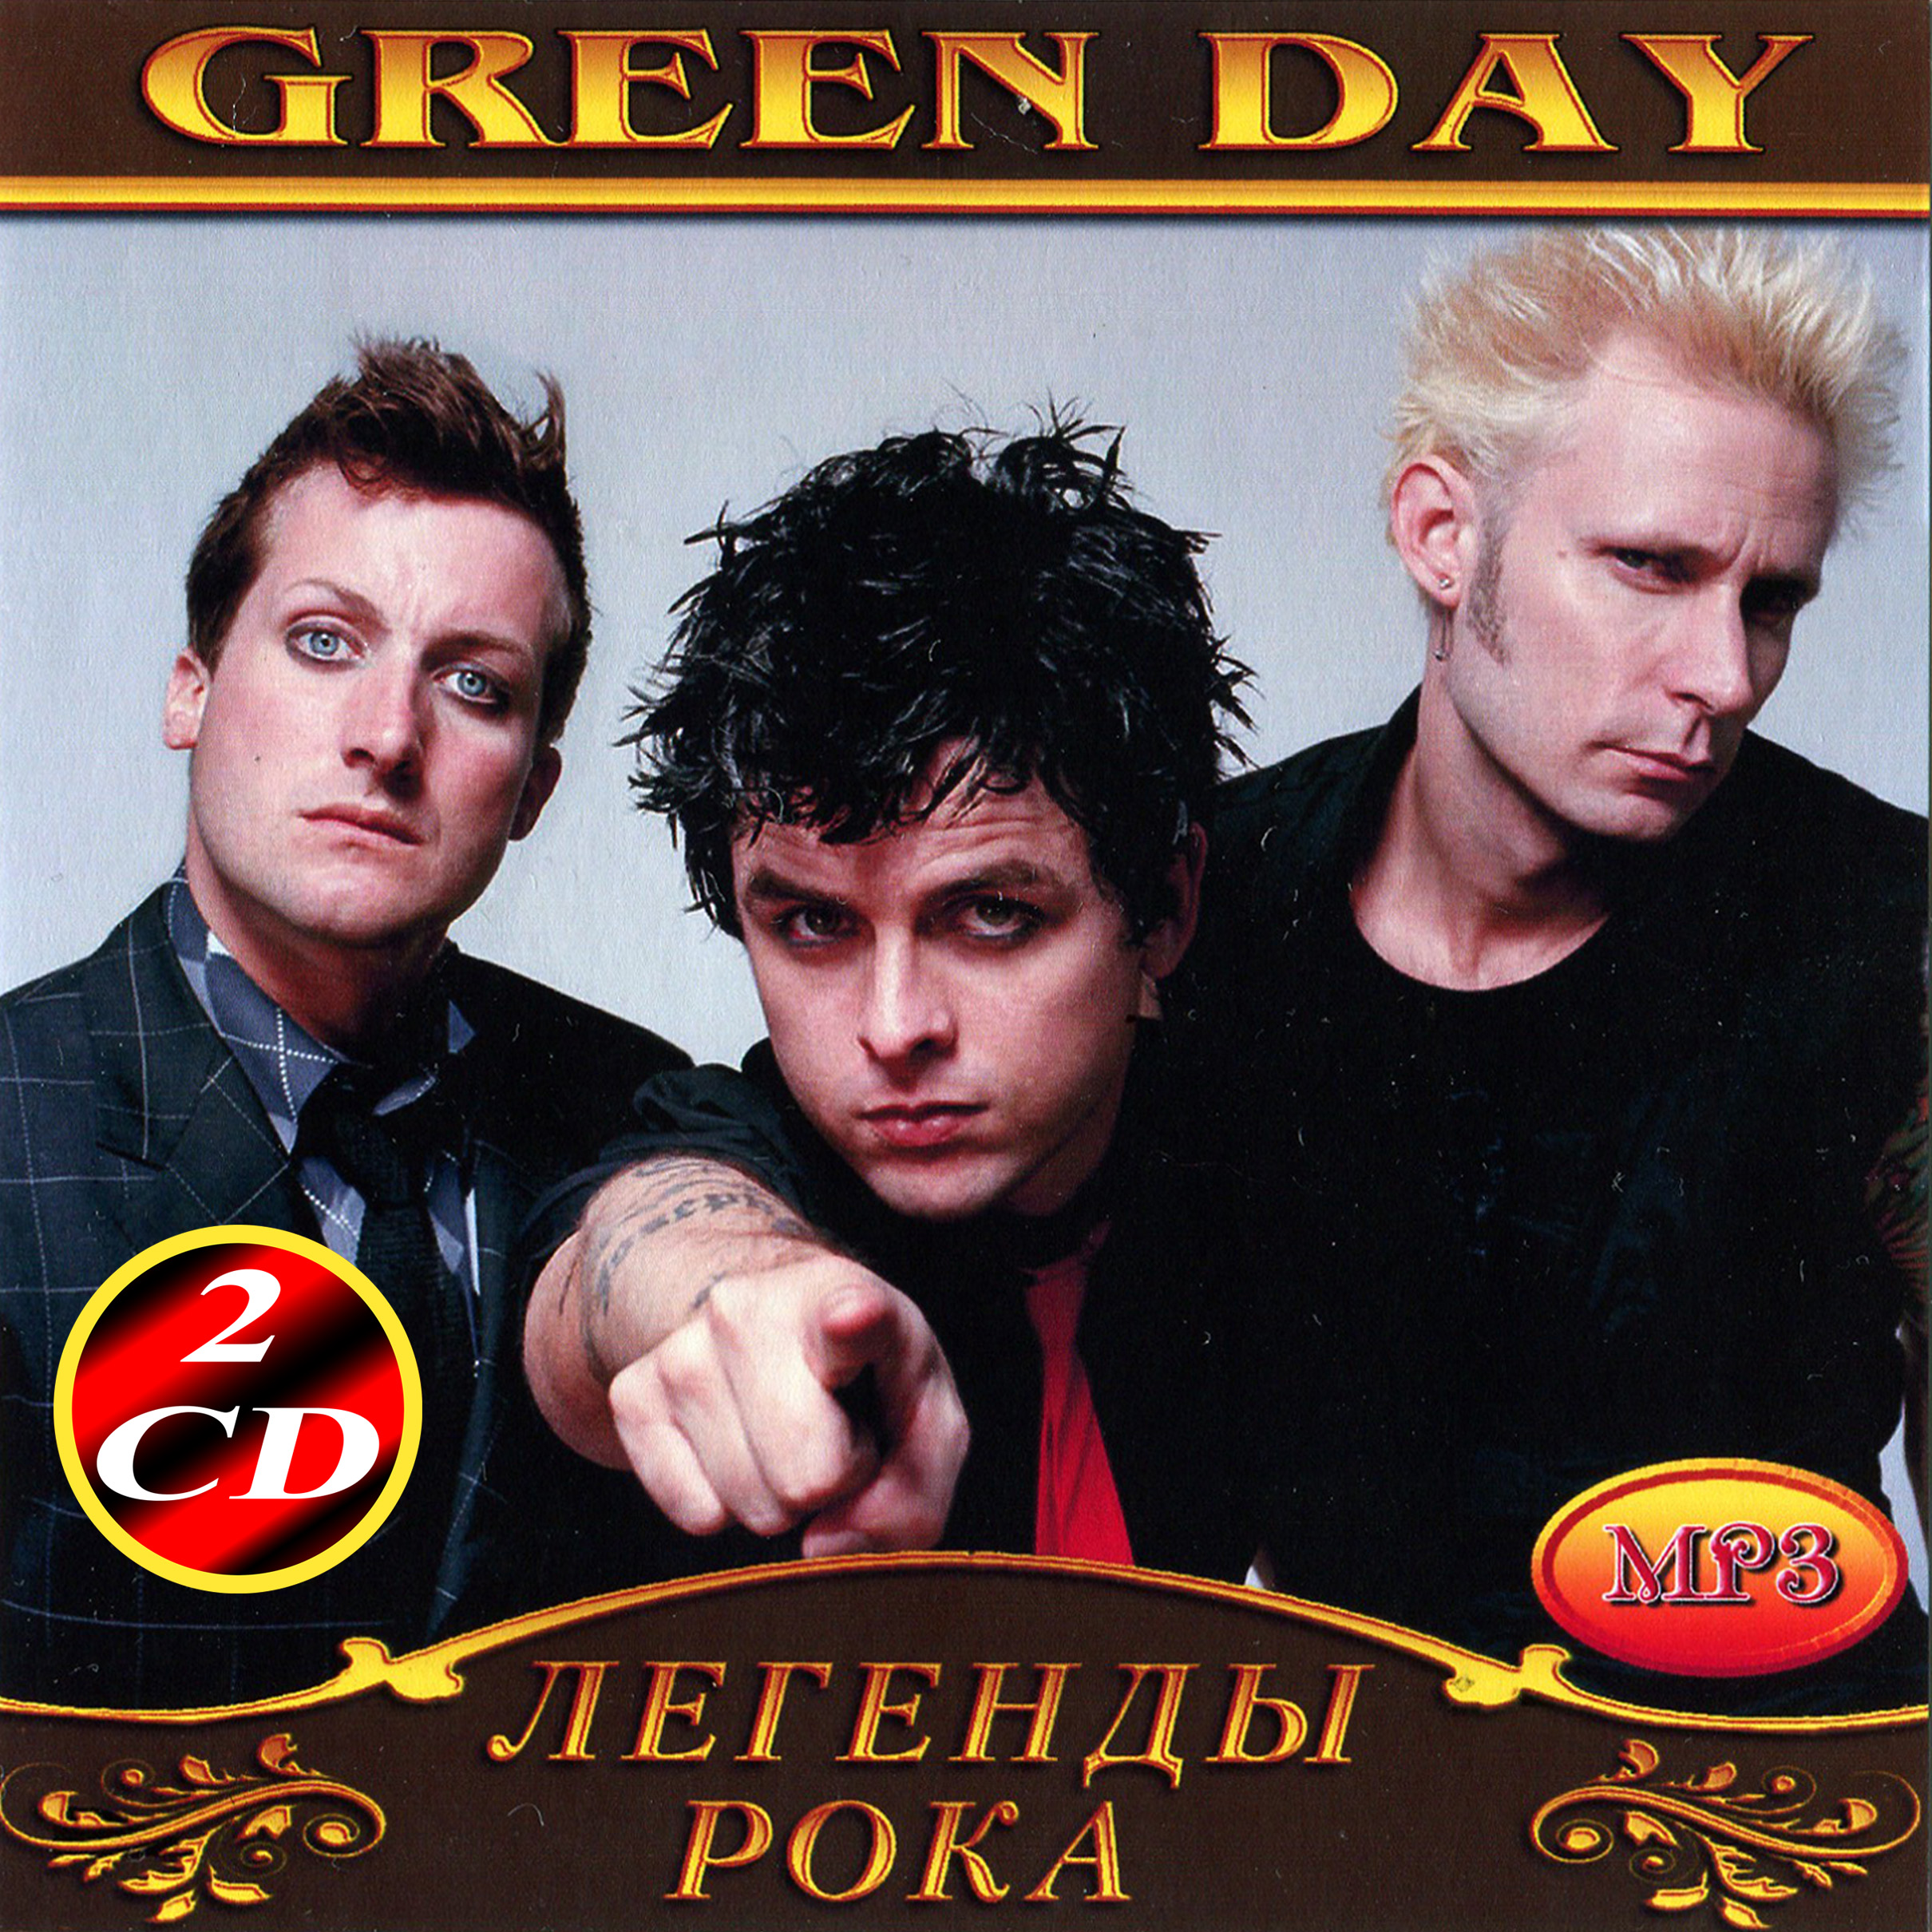 Green Day 2cd [mp3]